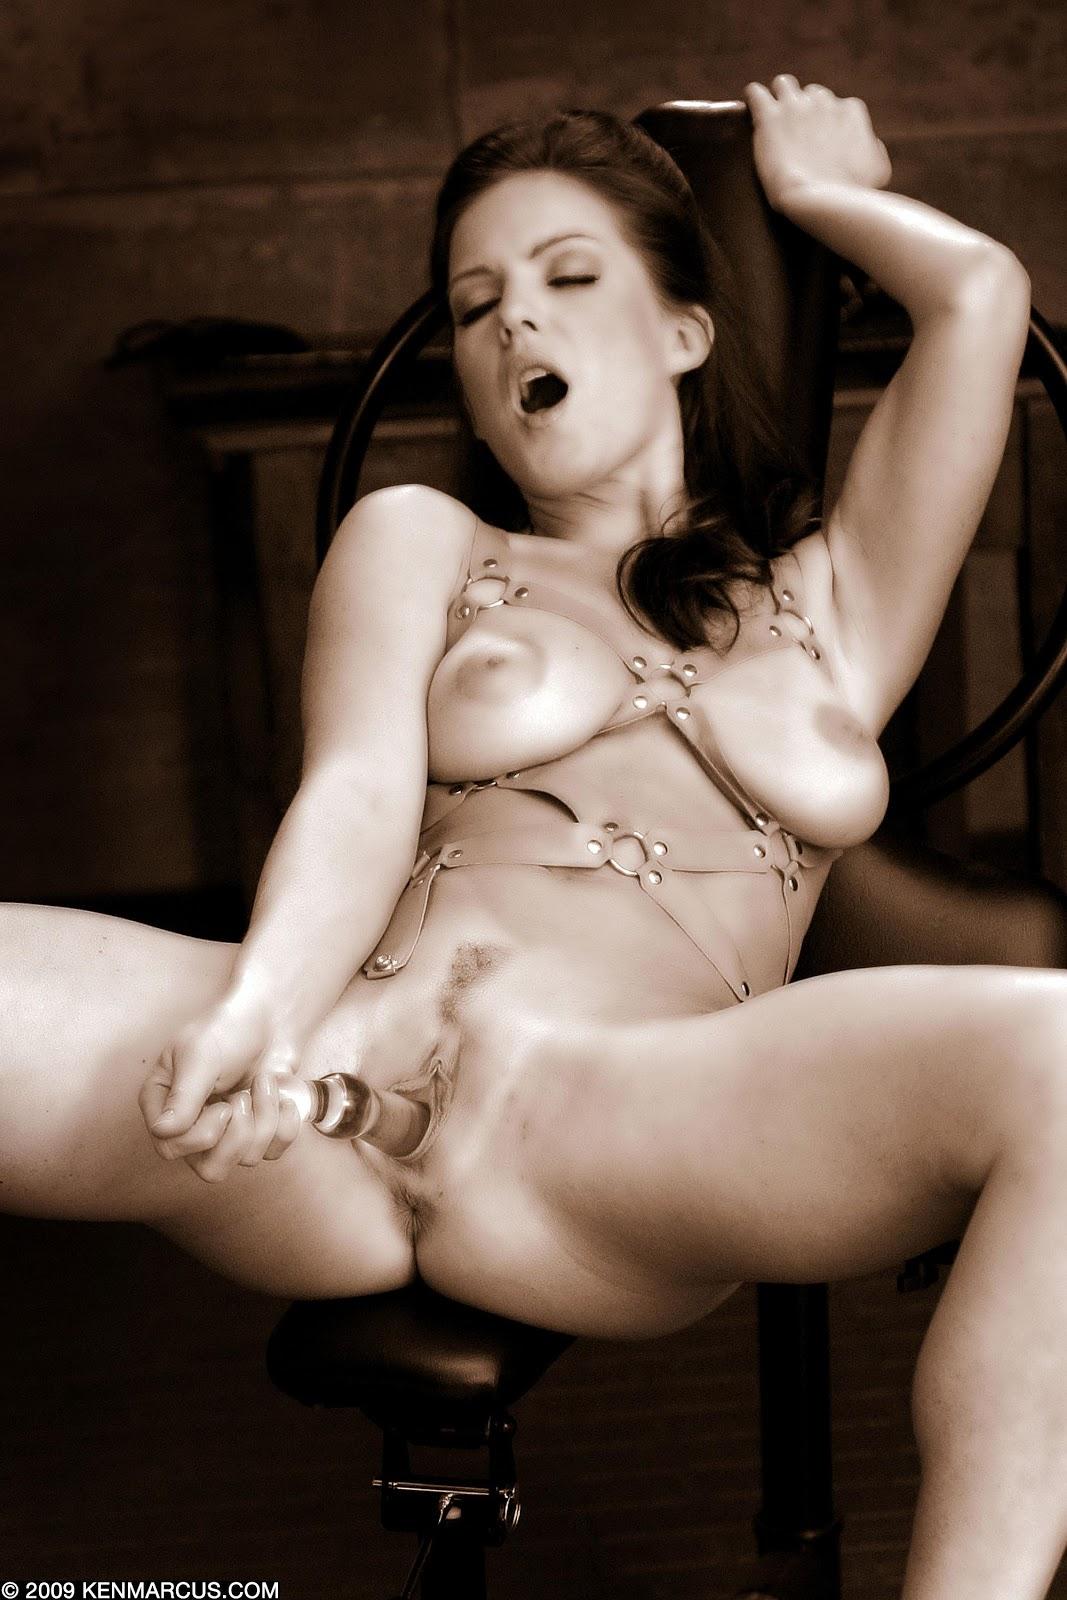 hot girls big boobs nude beach remarkable, very